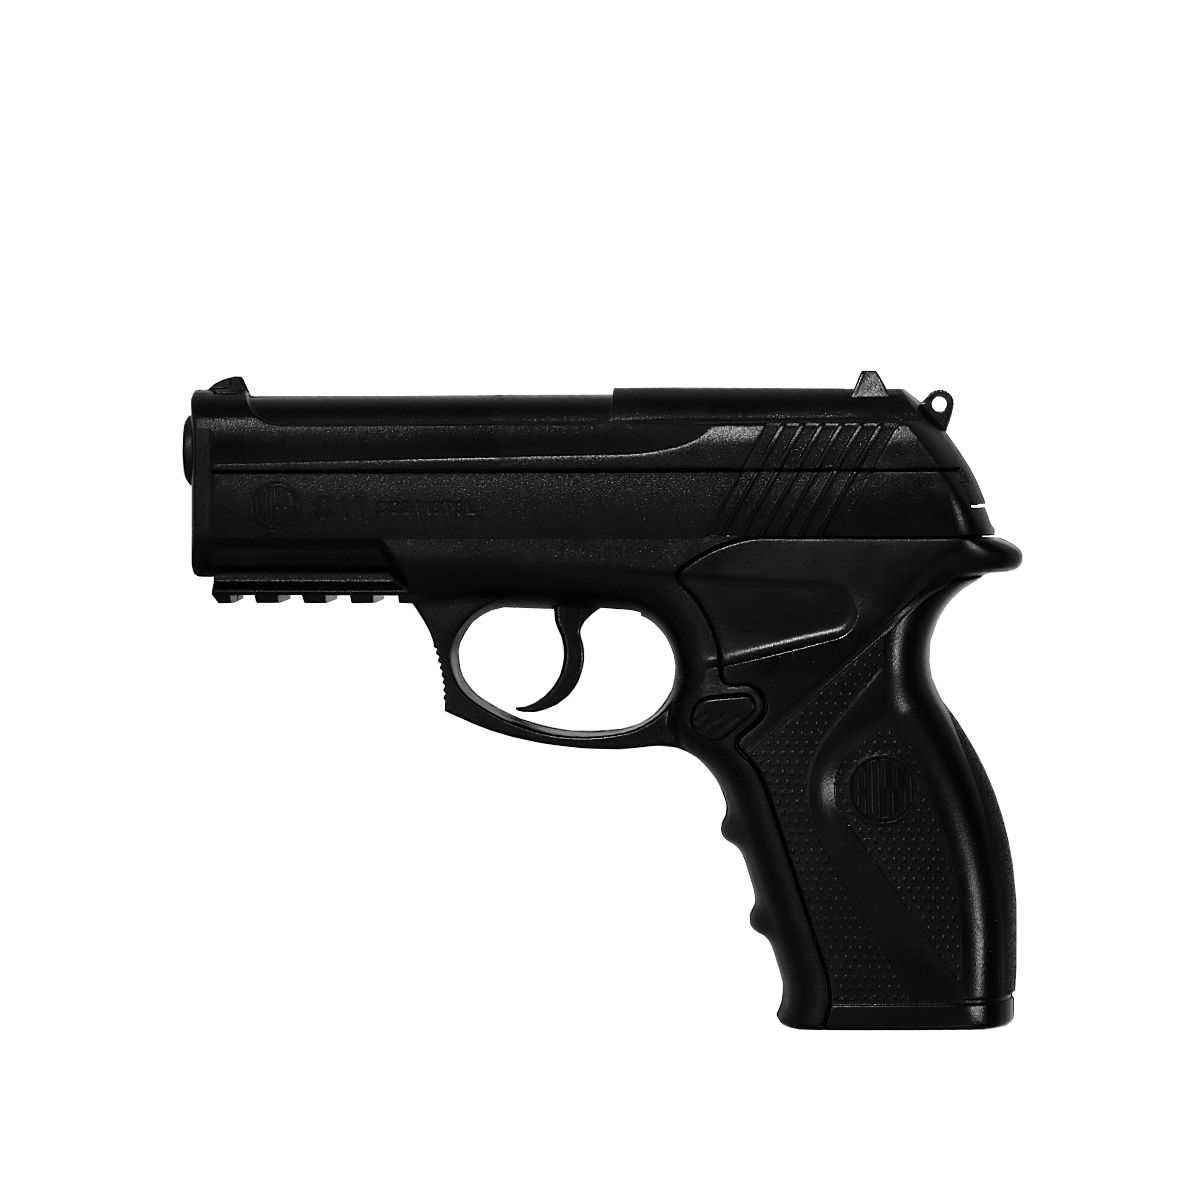 Pistola de Pressão Co2 WG Rossi C11 4,5mm - 17 Tiros